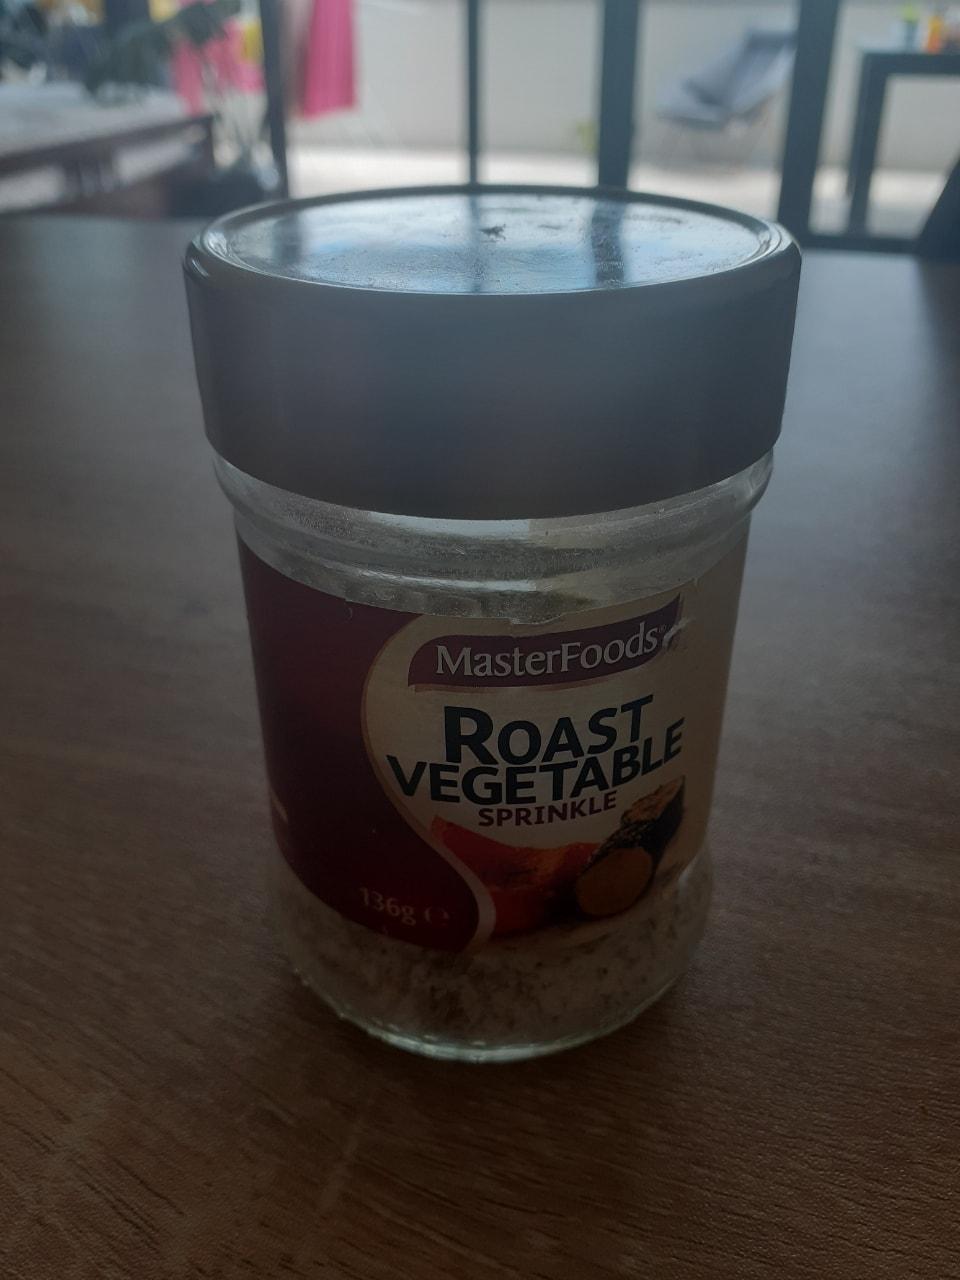 Roast veg sprinkle